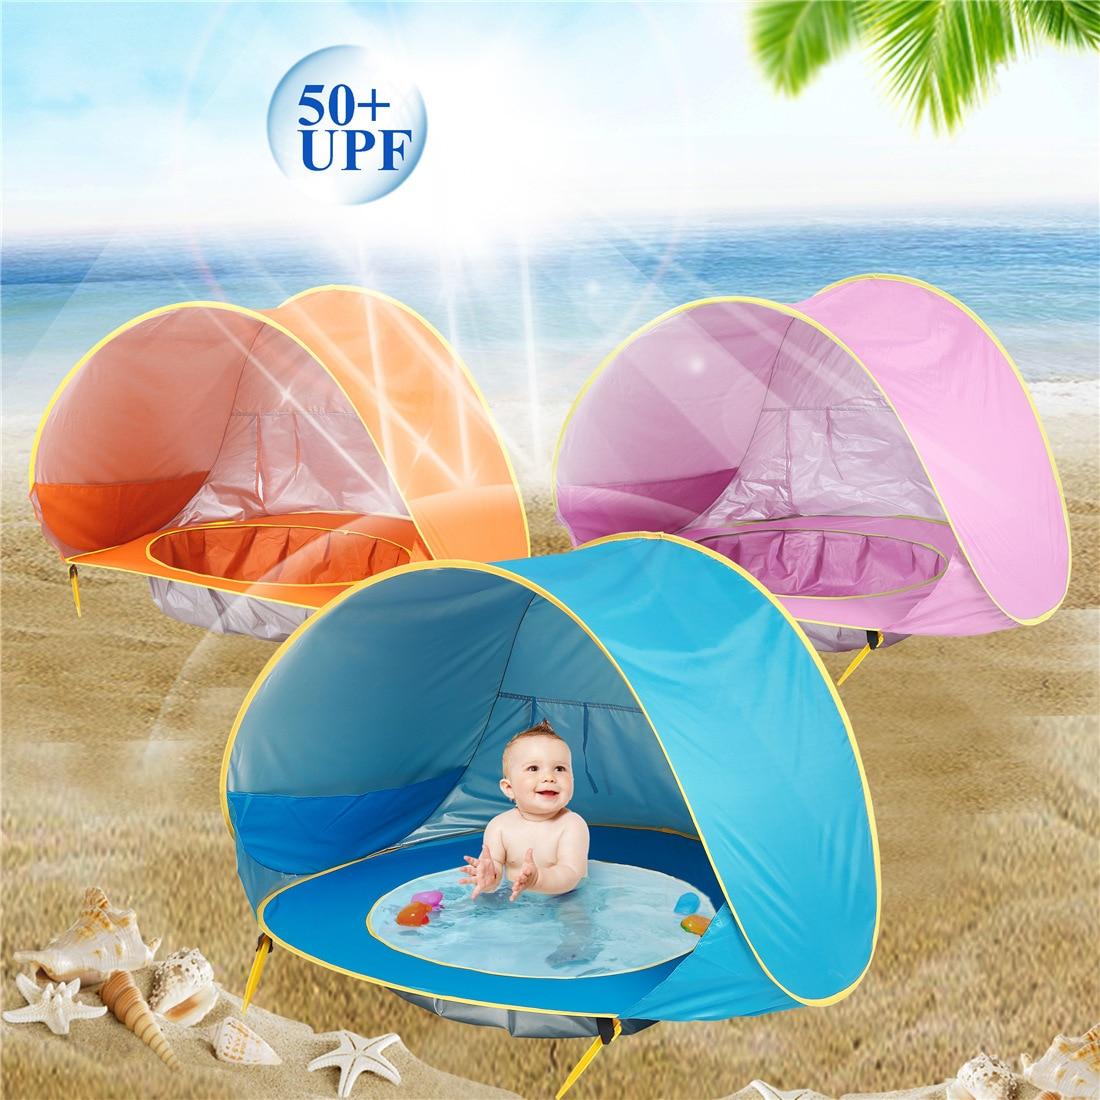 Baby Beach Tent Children Waterproof Sun Awning Tent UV-protecting Sunshelter  Child Swimming Pool Outdoor Camping Sunshade Beach